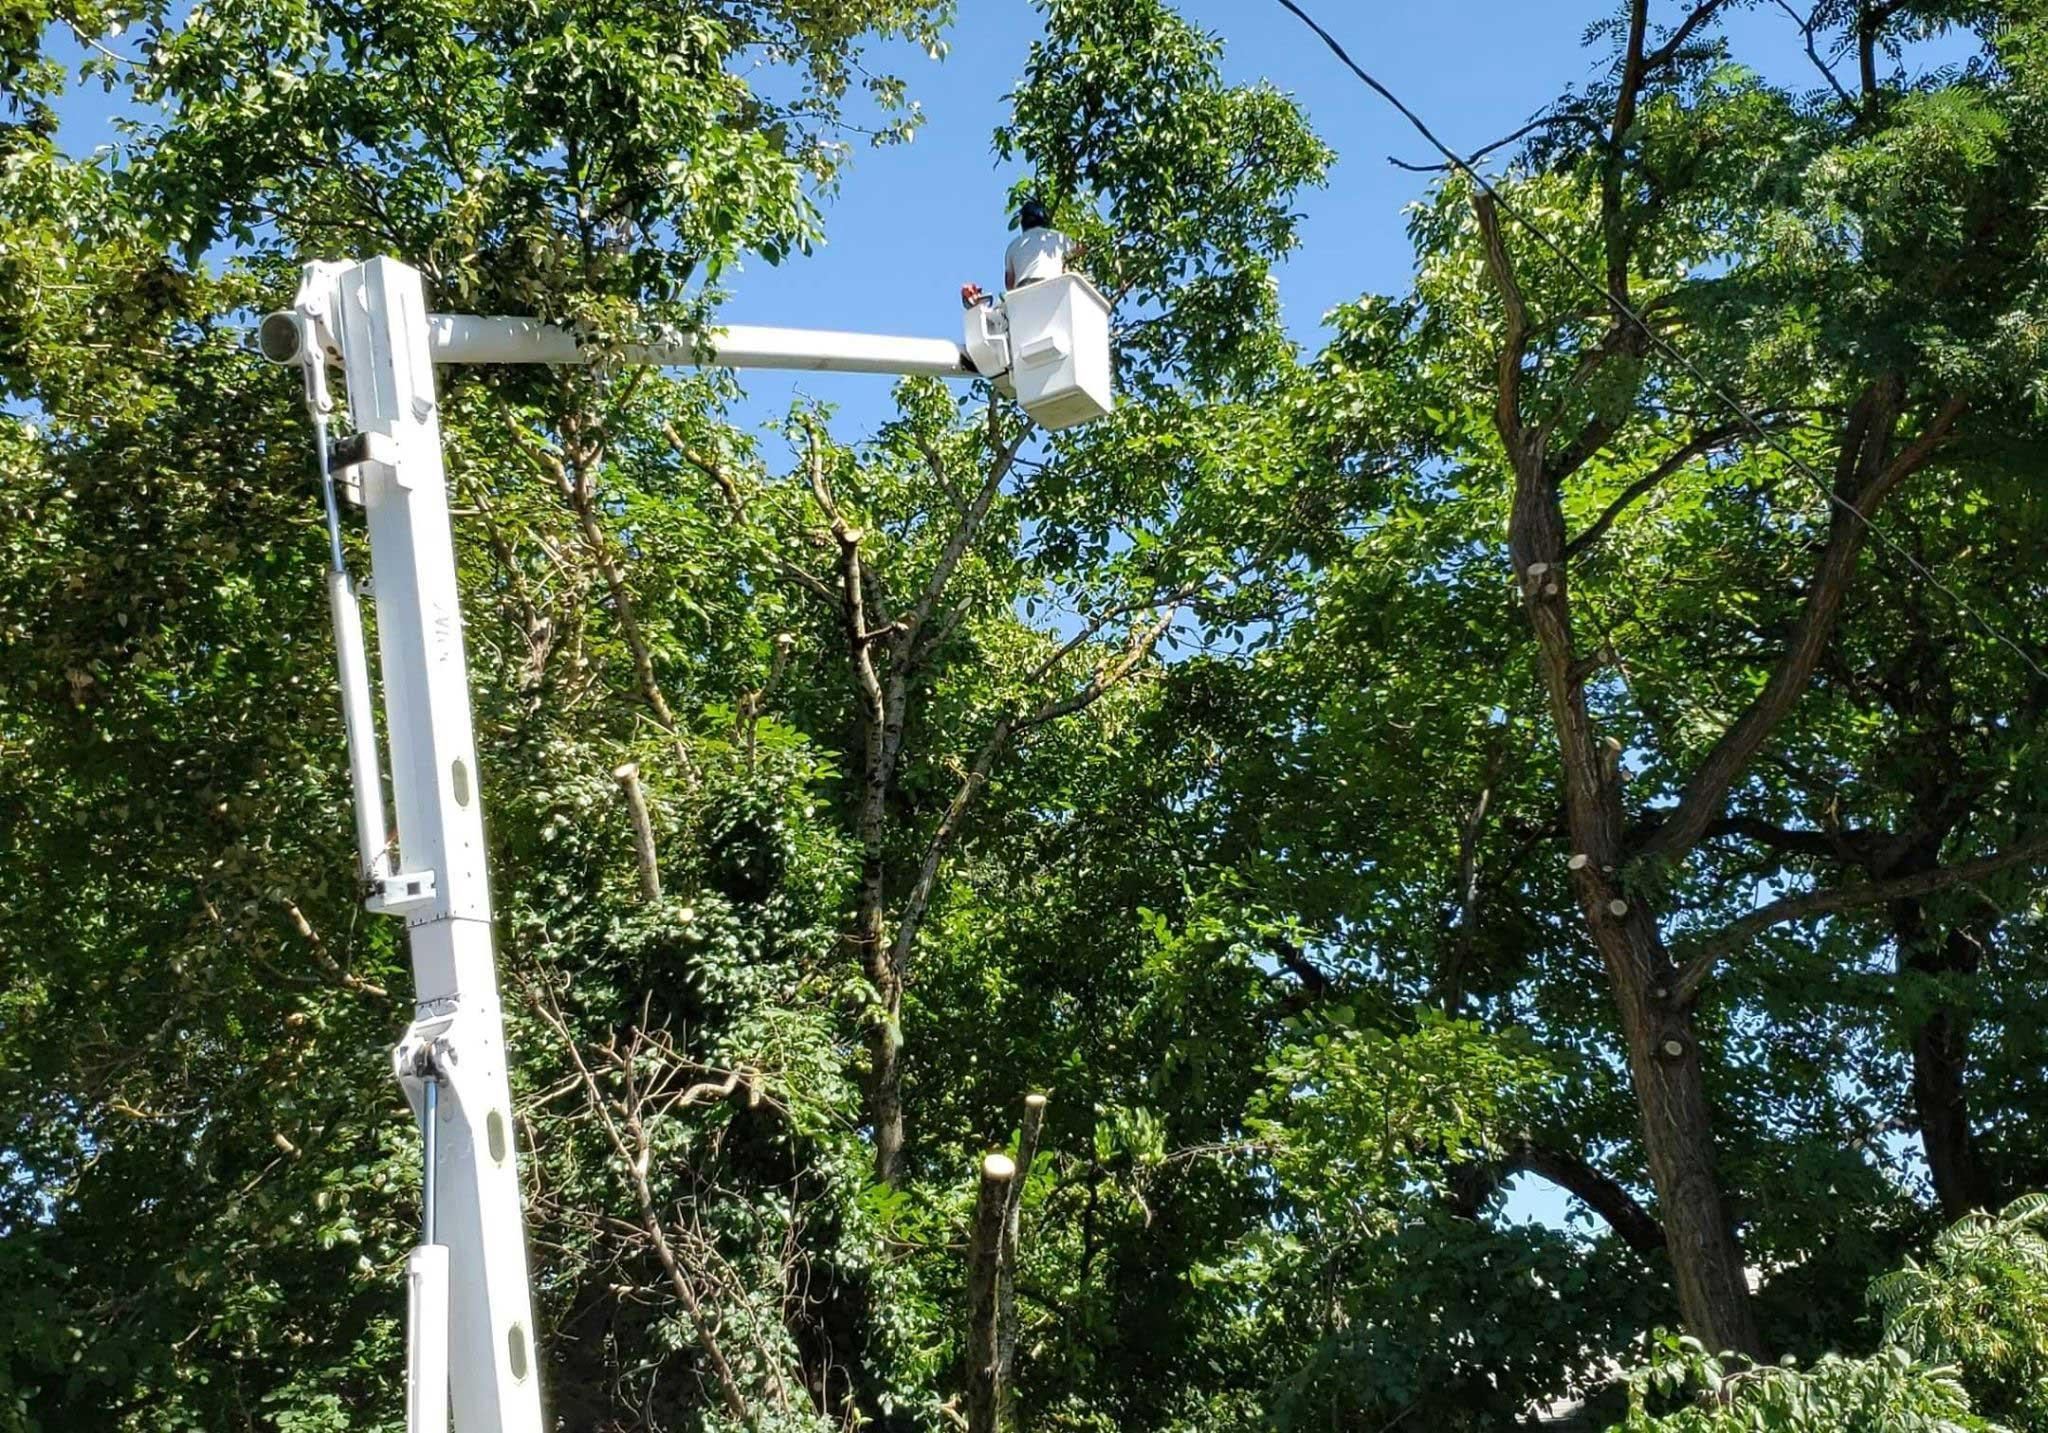 Tree Service Estimates | Tree Time Tree Service 4